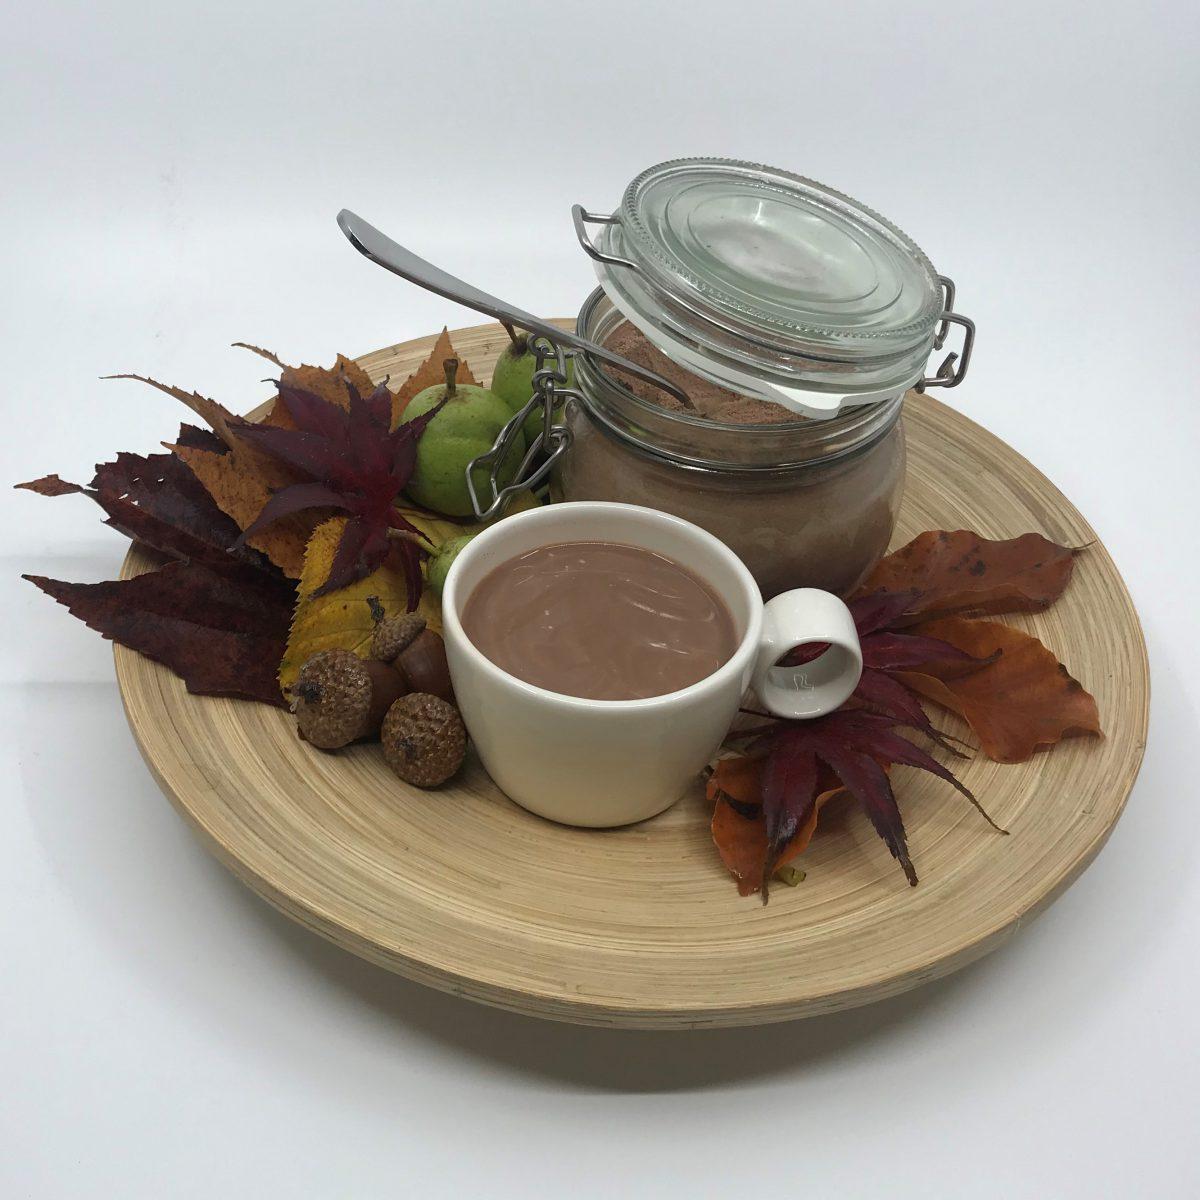 chocomelk mix croped (4)